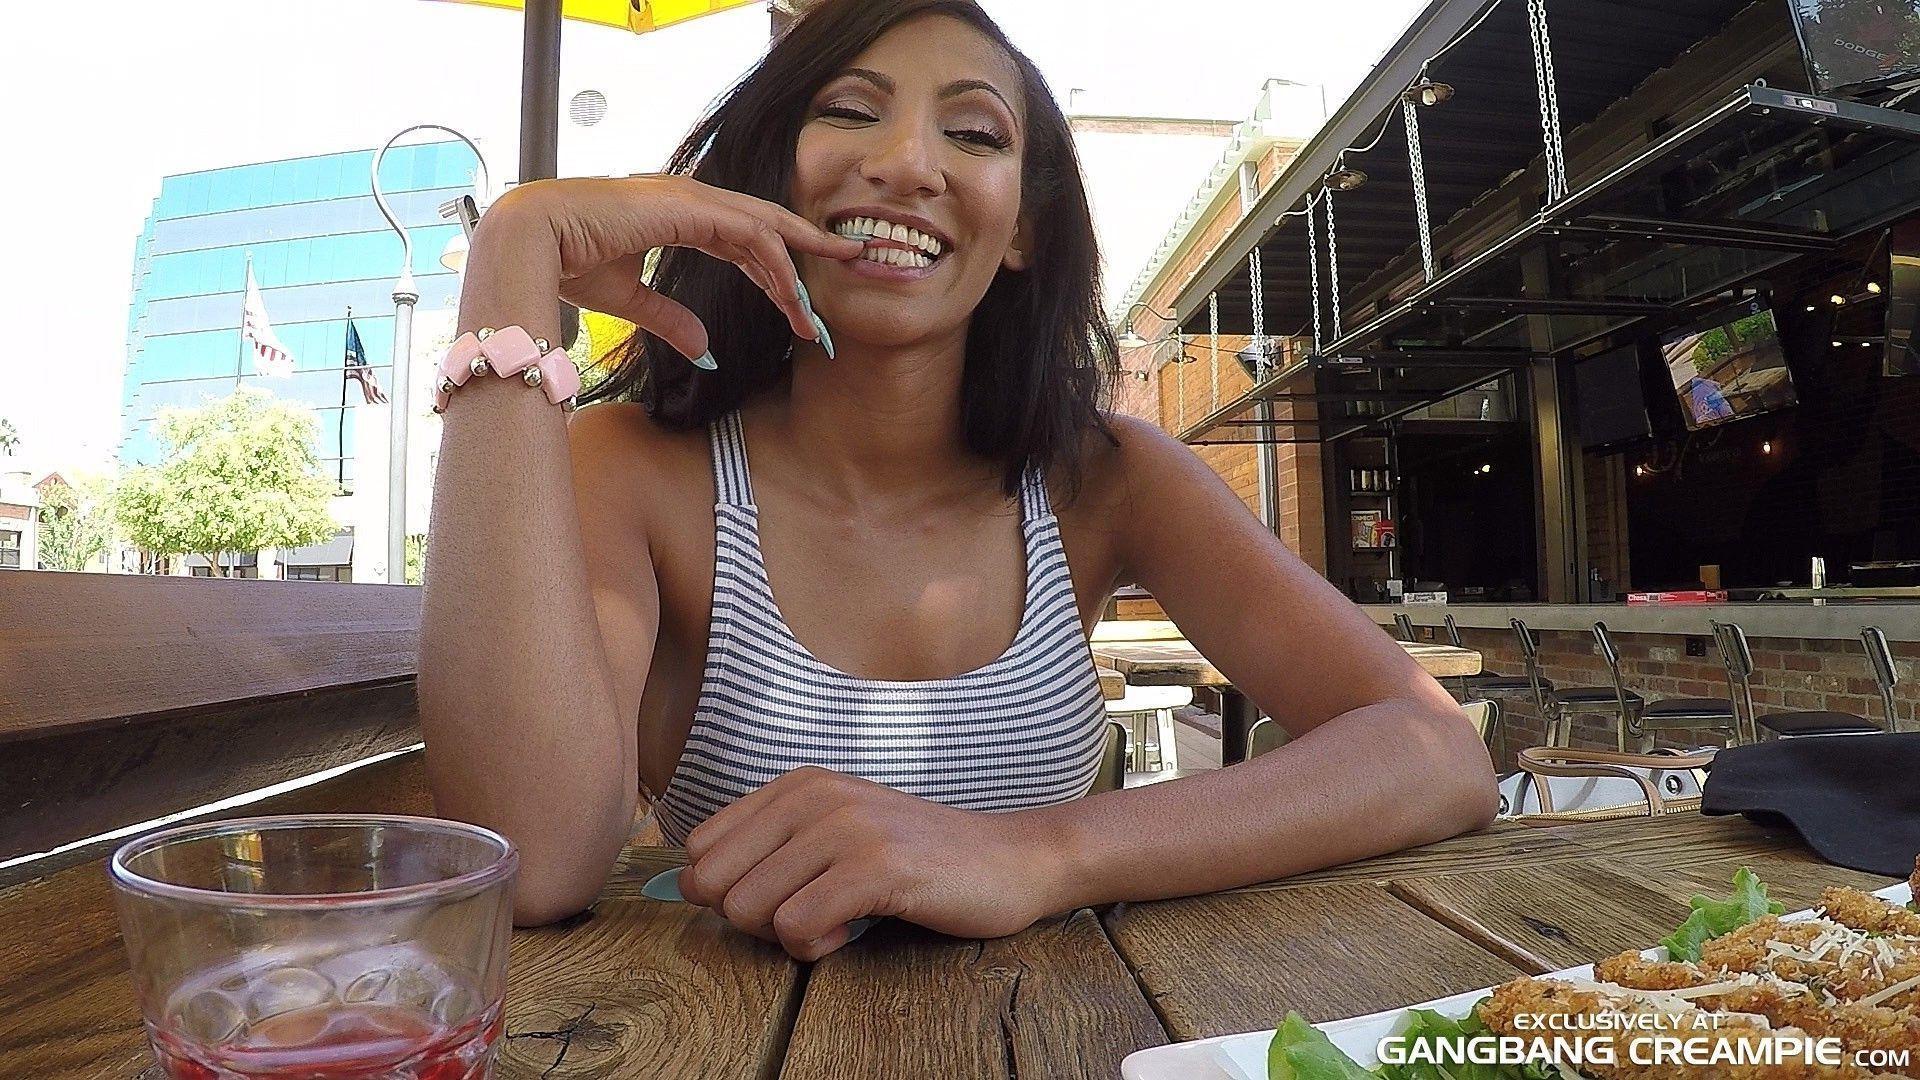 Sadie santana gangbang creampie at Pussy Porn Pics